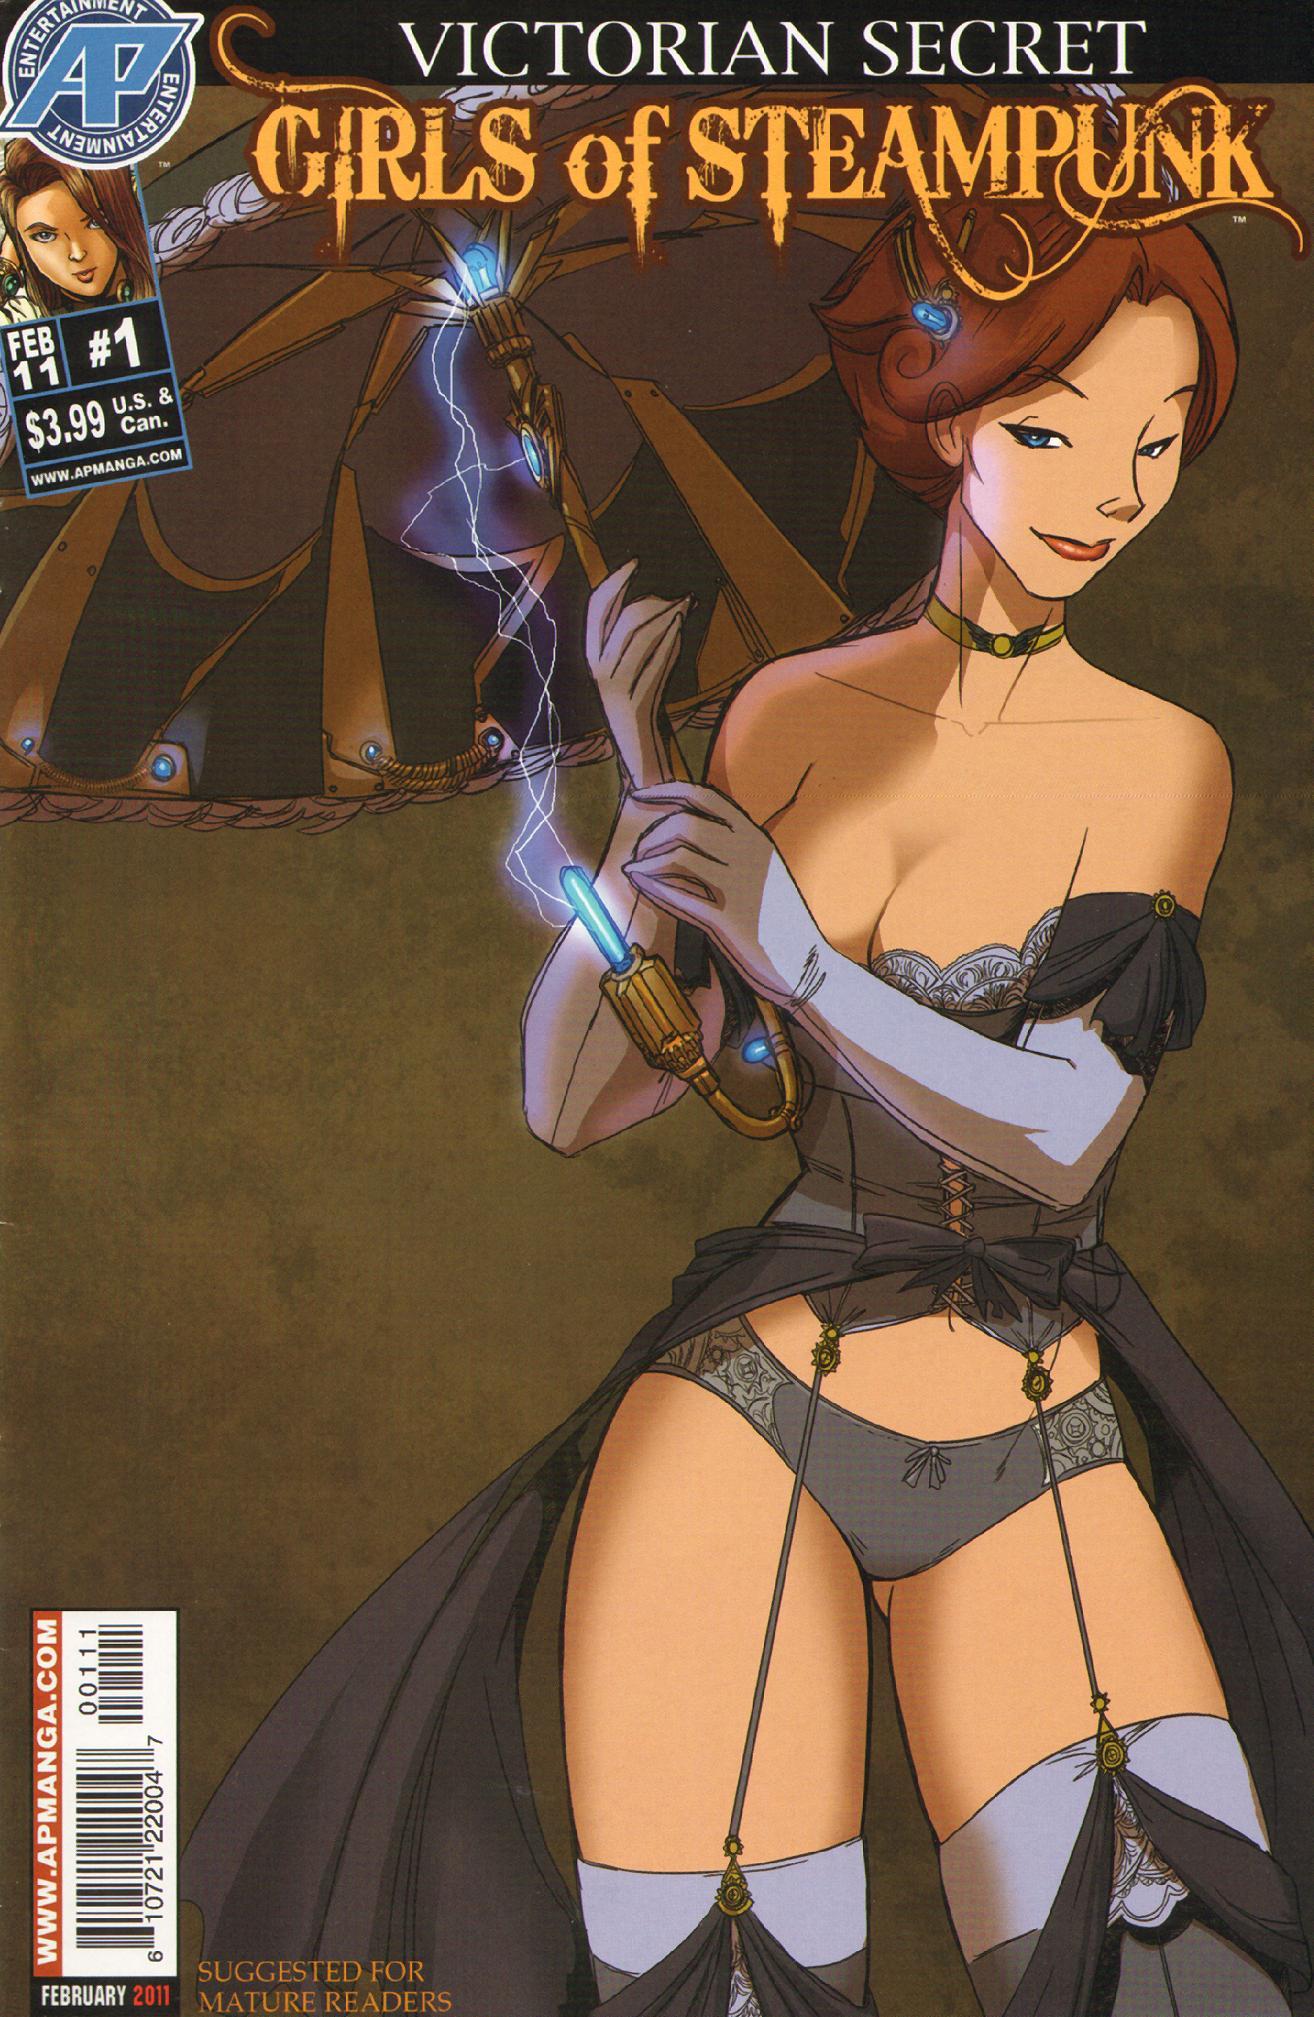 Victorian Secret: Girls of Steampunk 1 Page 1